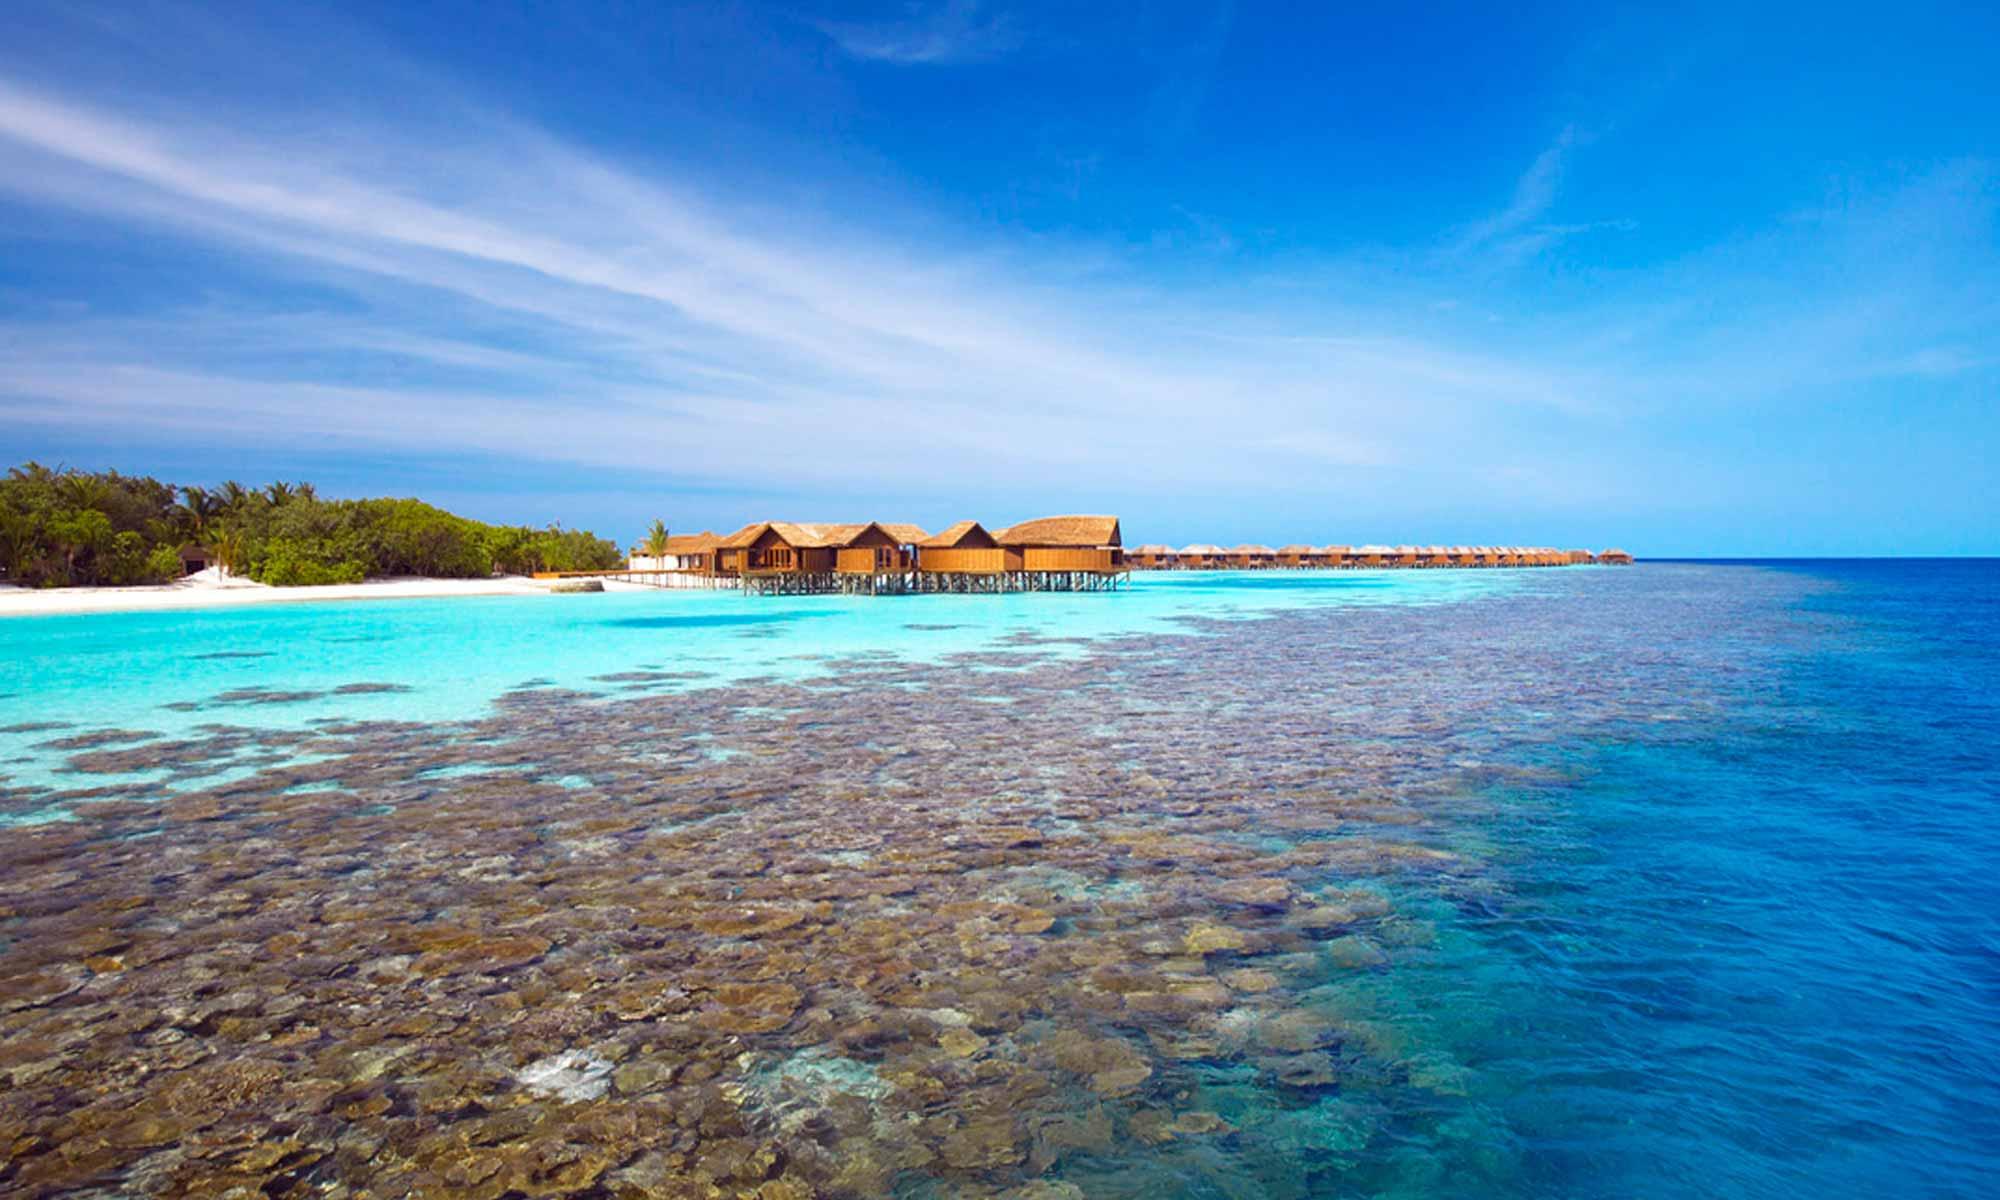 Slow Dive Indischer Ozean Malediven Pro Divers Lily Beach Hausriff